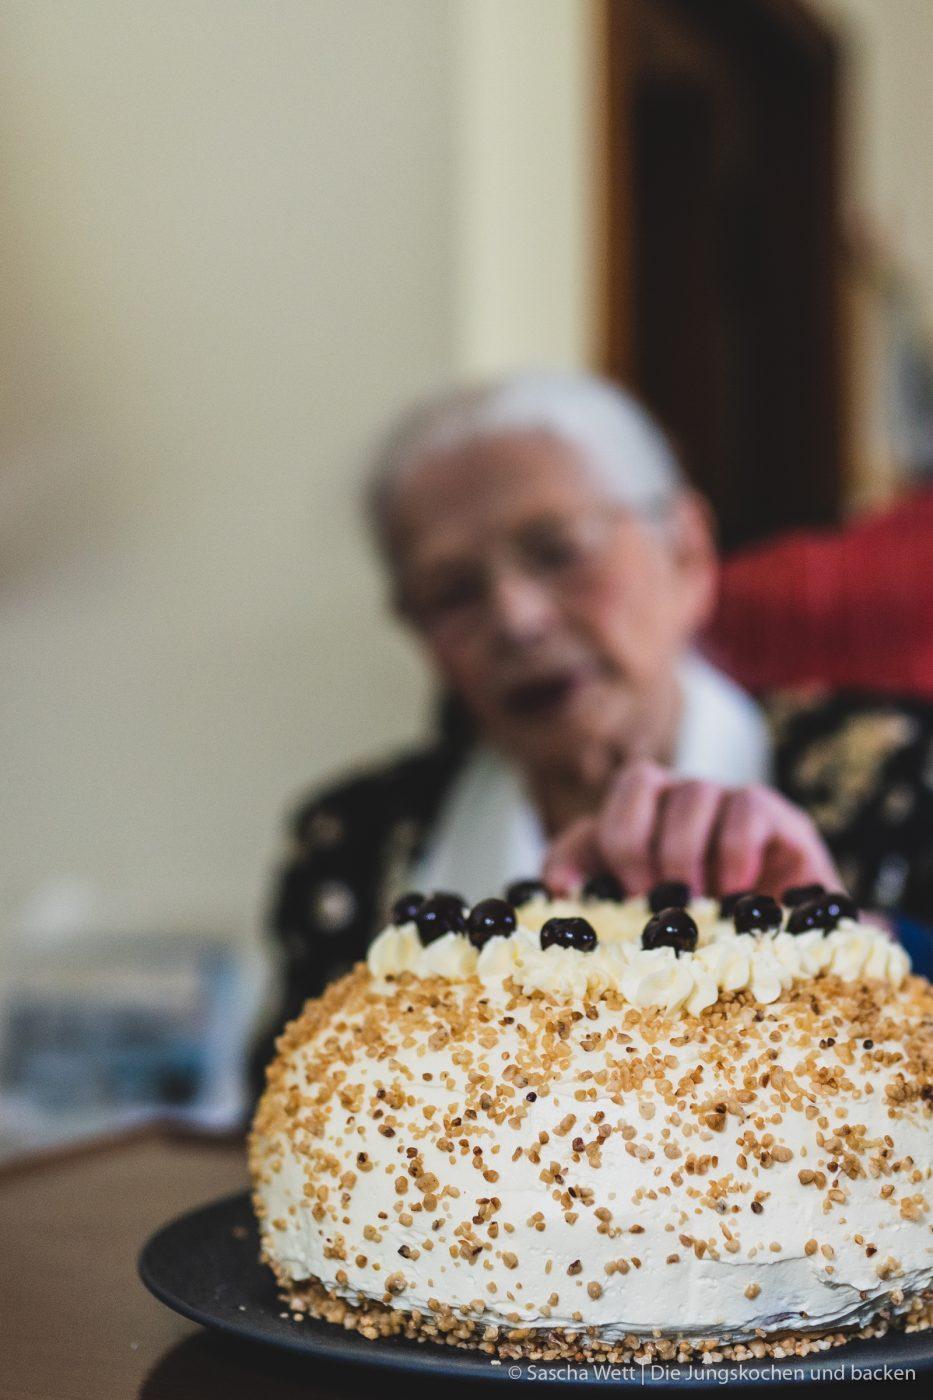 Oma Lore prüft, ob der Frankfurter Kranz gut ist